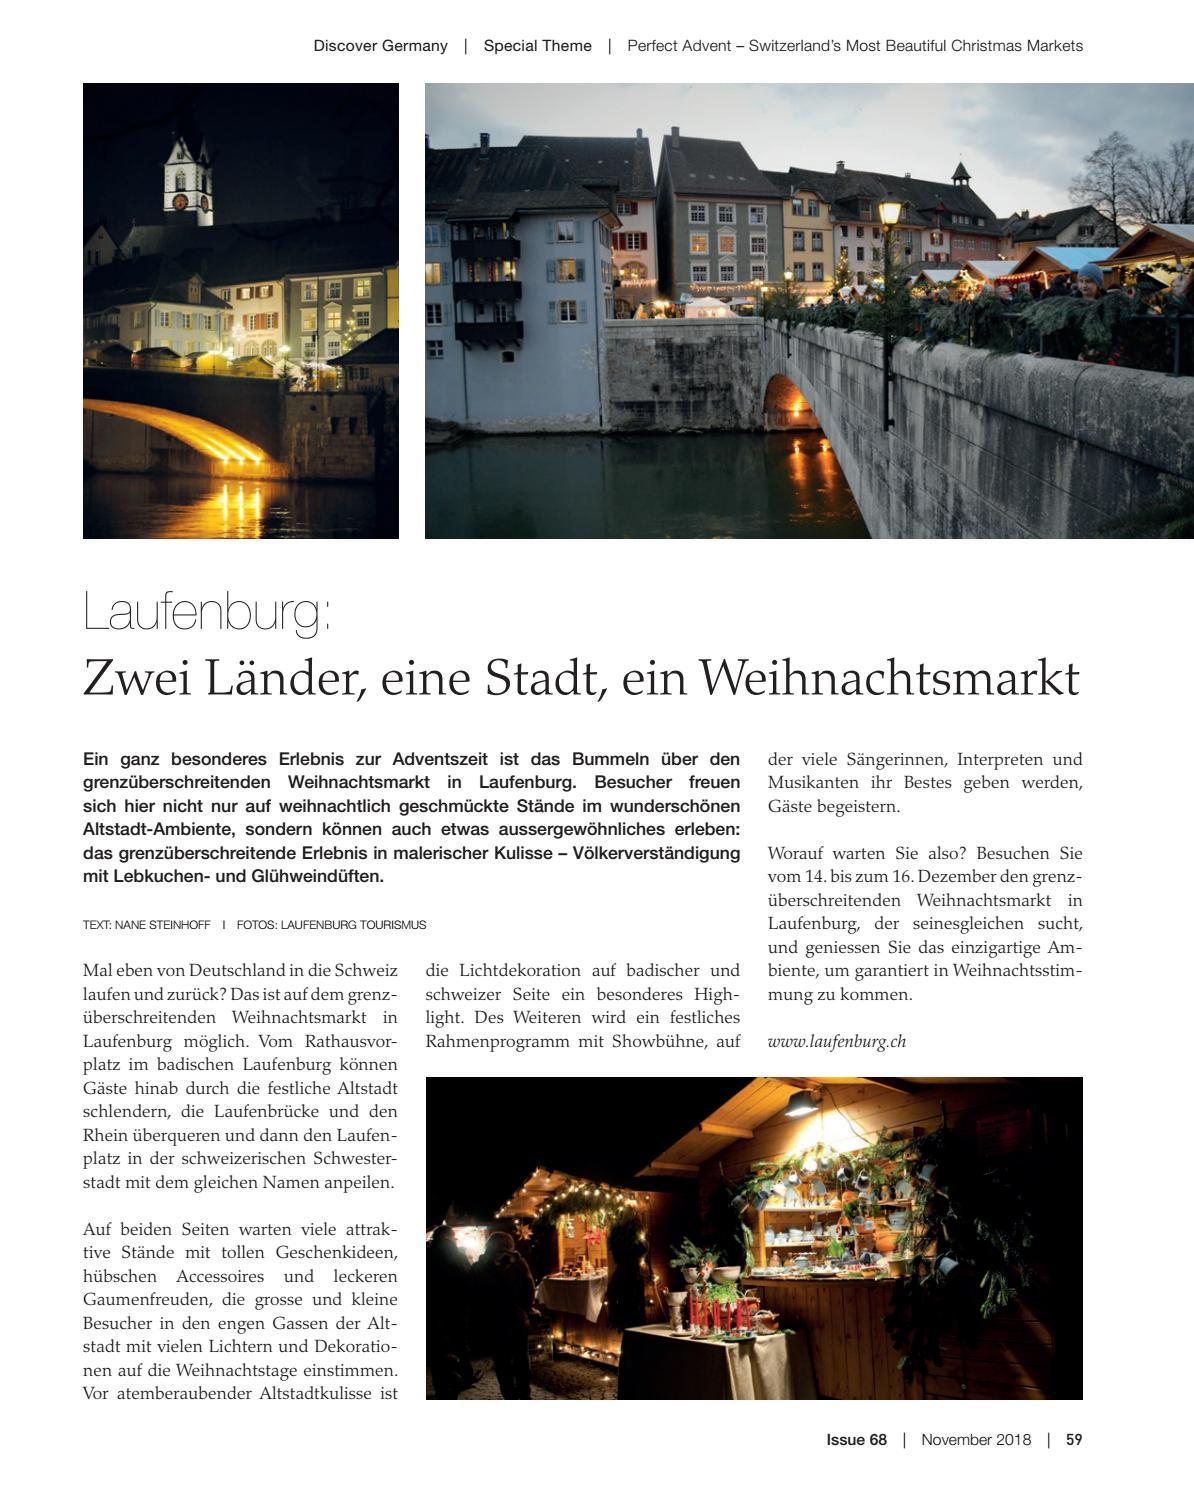 Weihnachtsmarkt Laufenburg.Discover Germany Issue 68 November 2018 By Scan Group Issuu